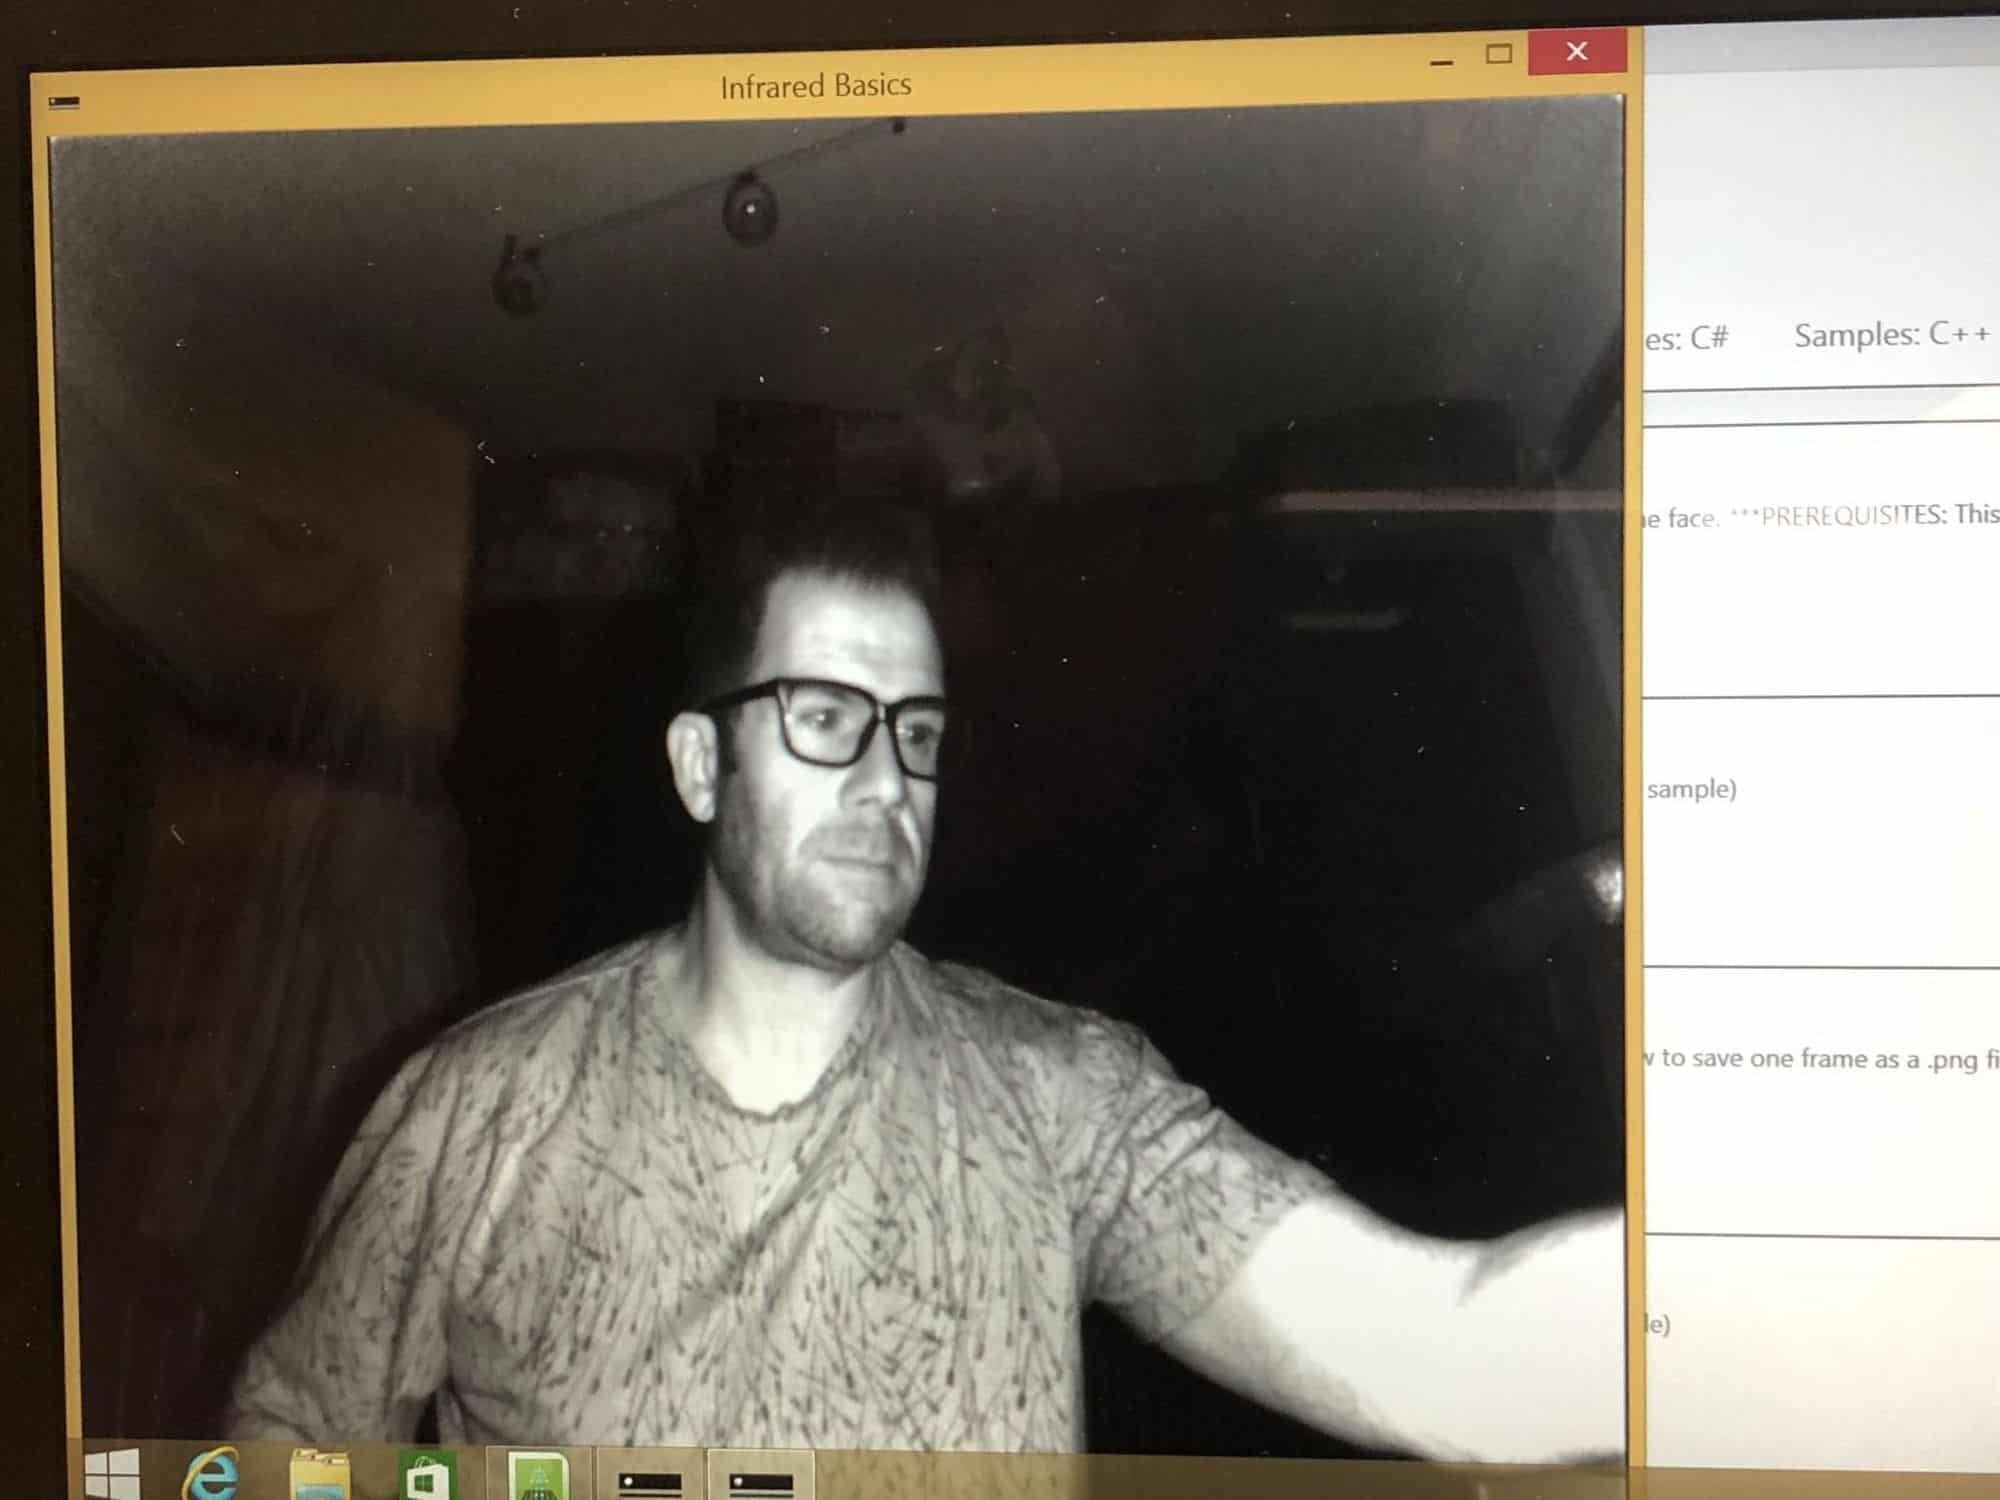 Kinect SLS v2 ghost hunting tablet pc